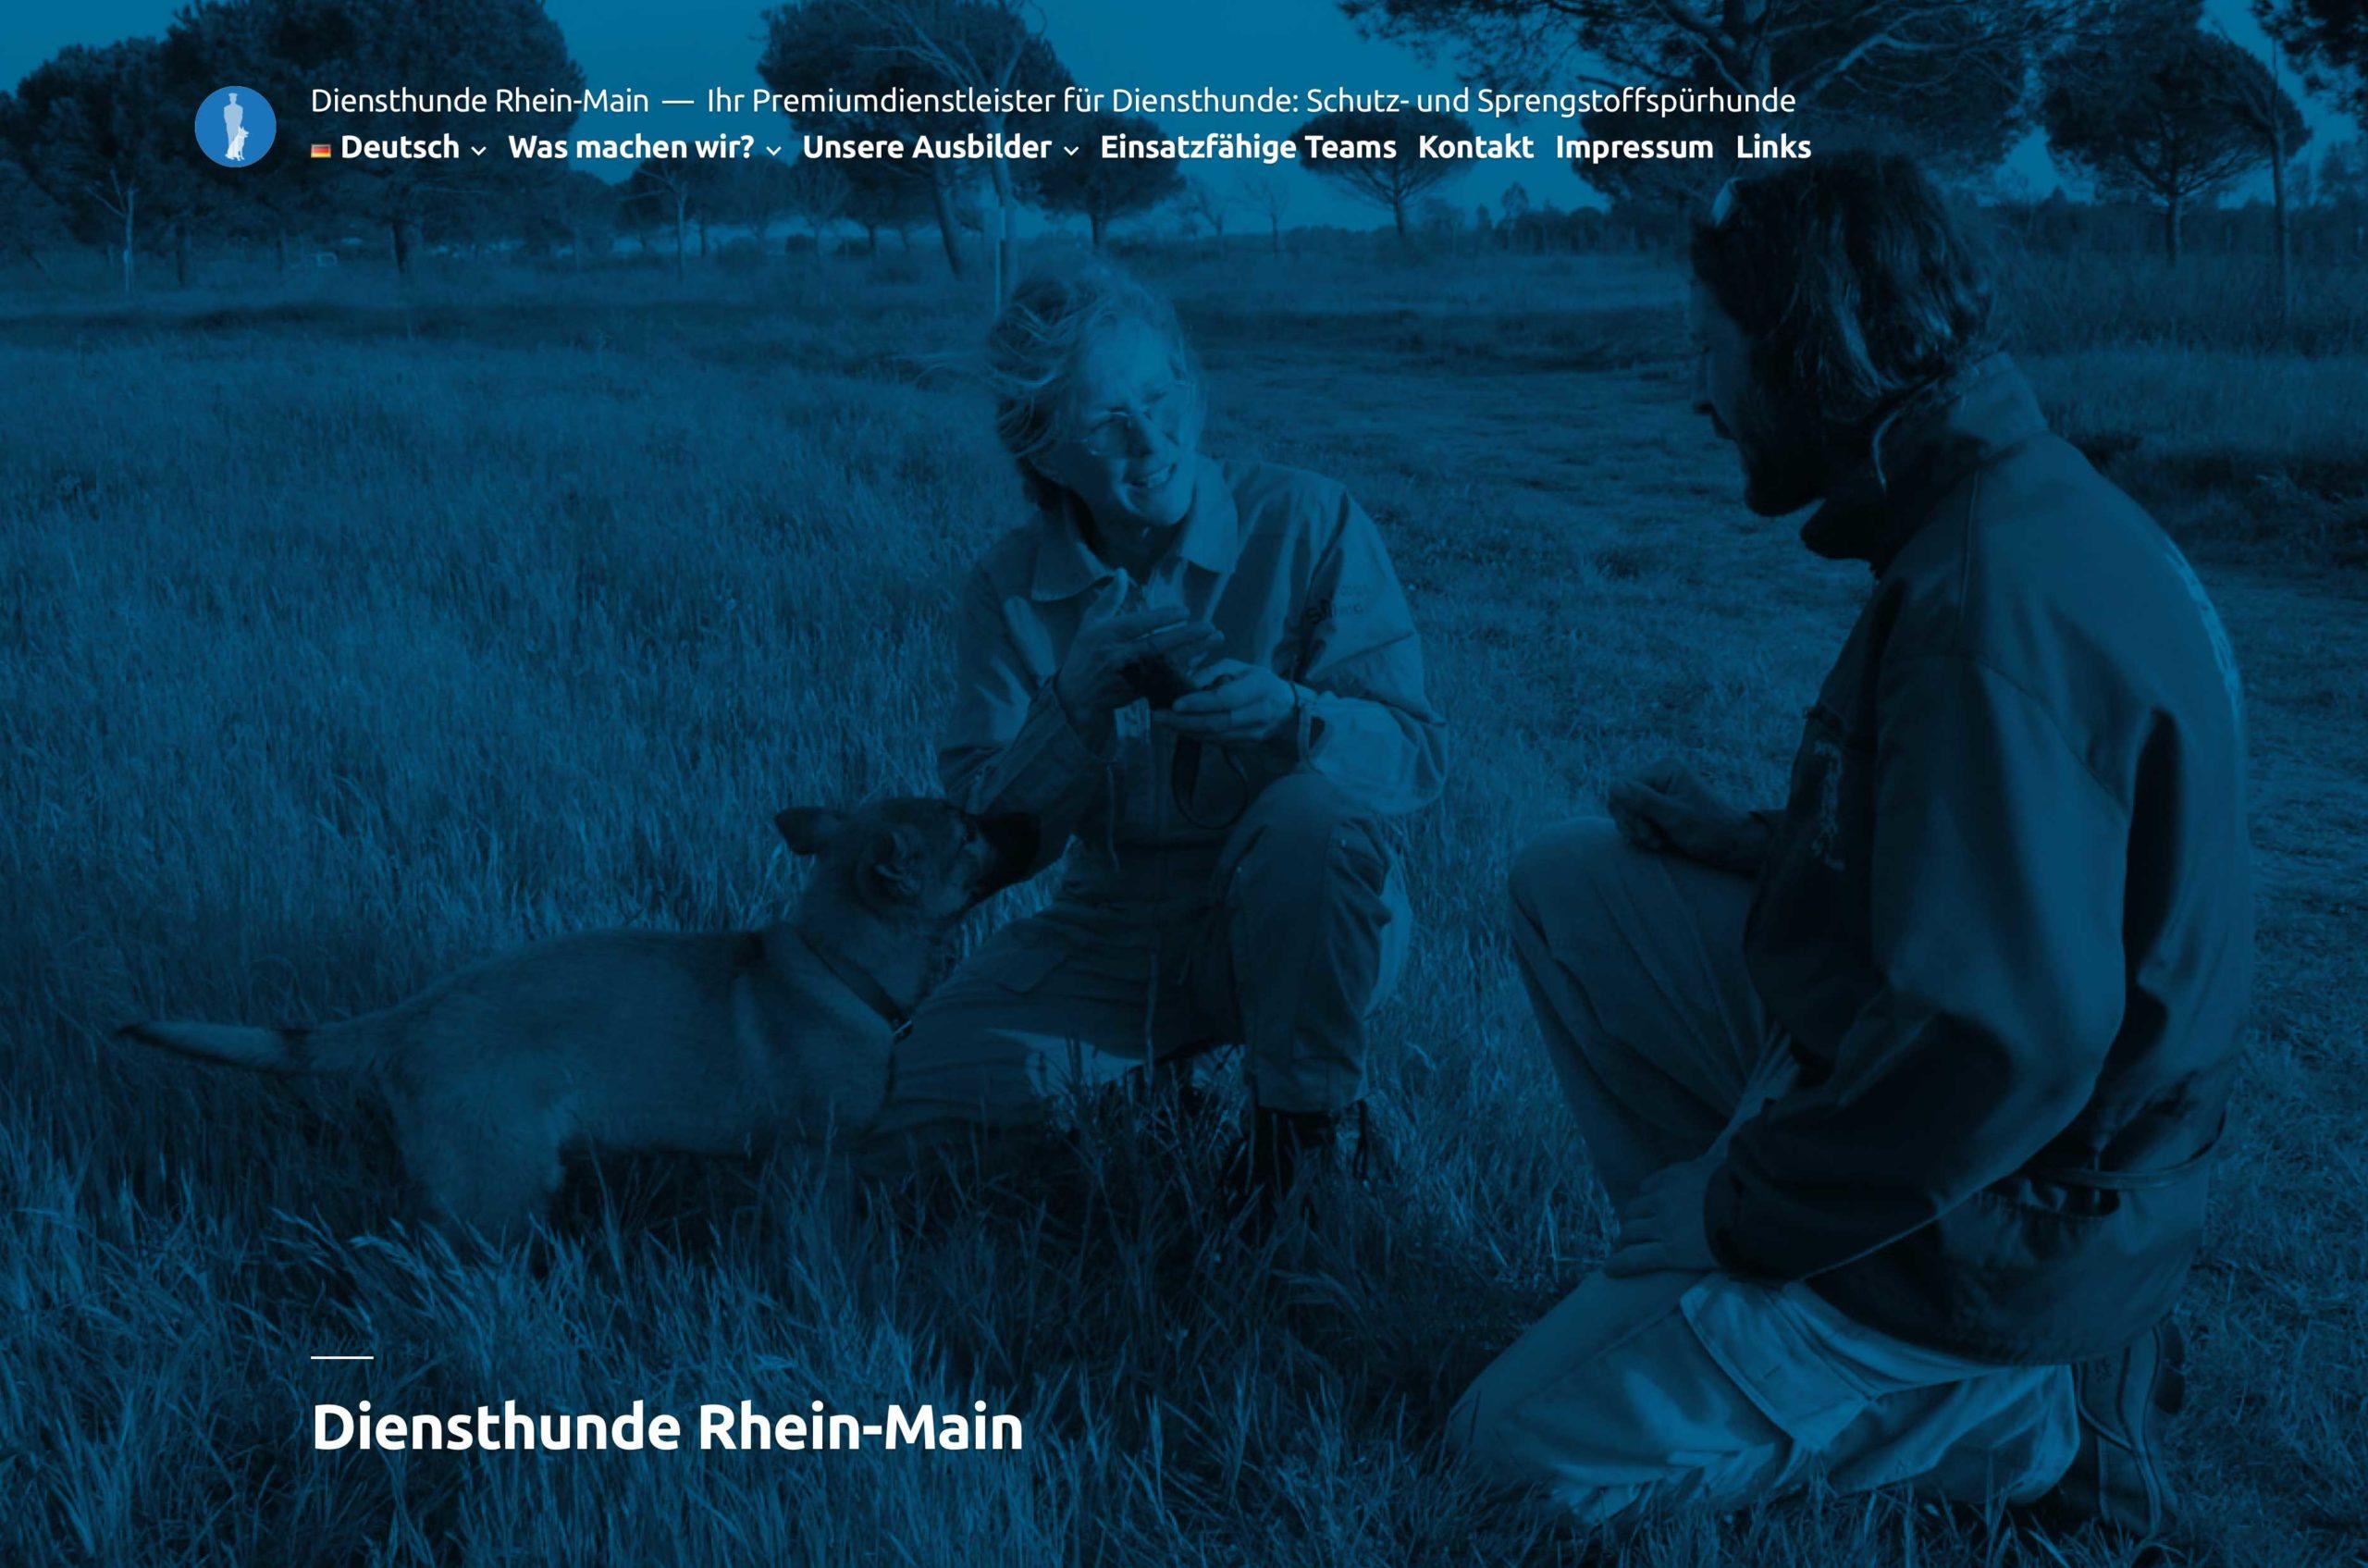 diensthunde rhein-main screenshot